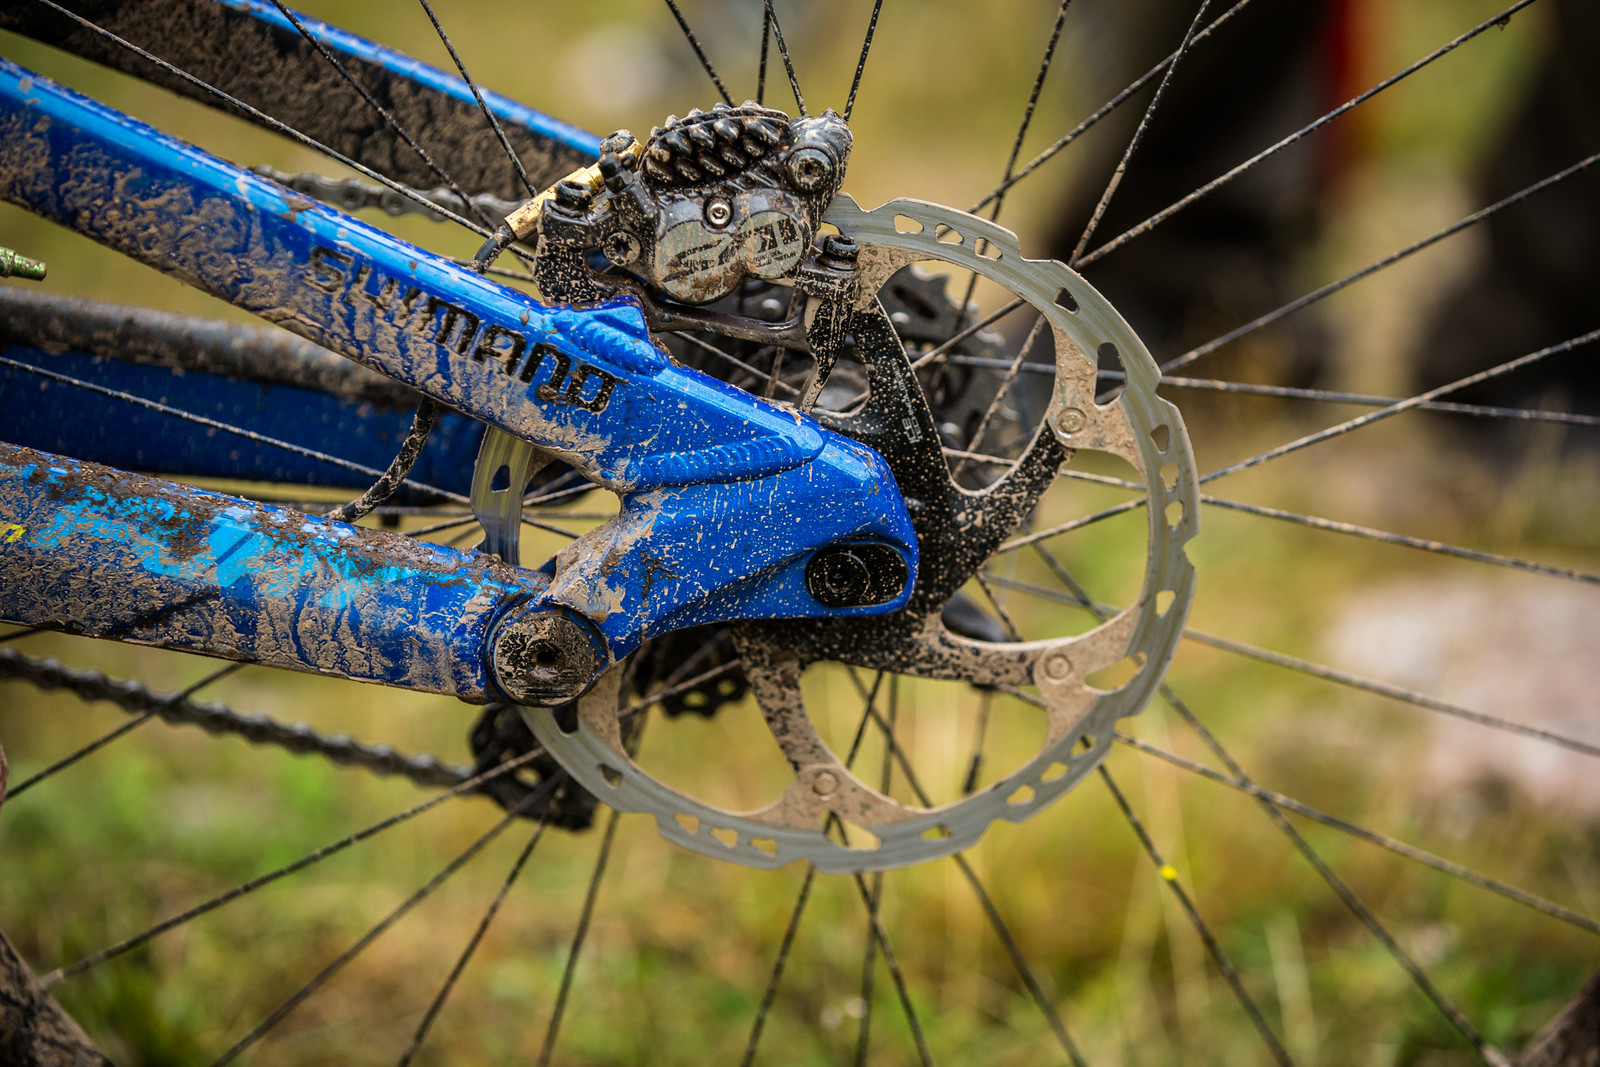 Shimano Saint Brakes - WINNING BIKE - Martin Maes' GT Fury - Mountain Biking Pictures - Vital MTB